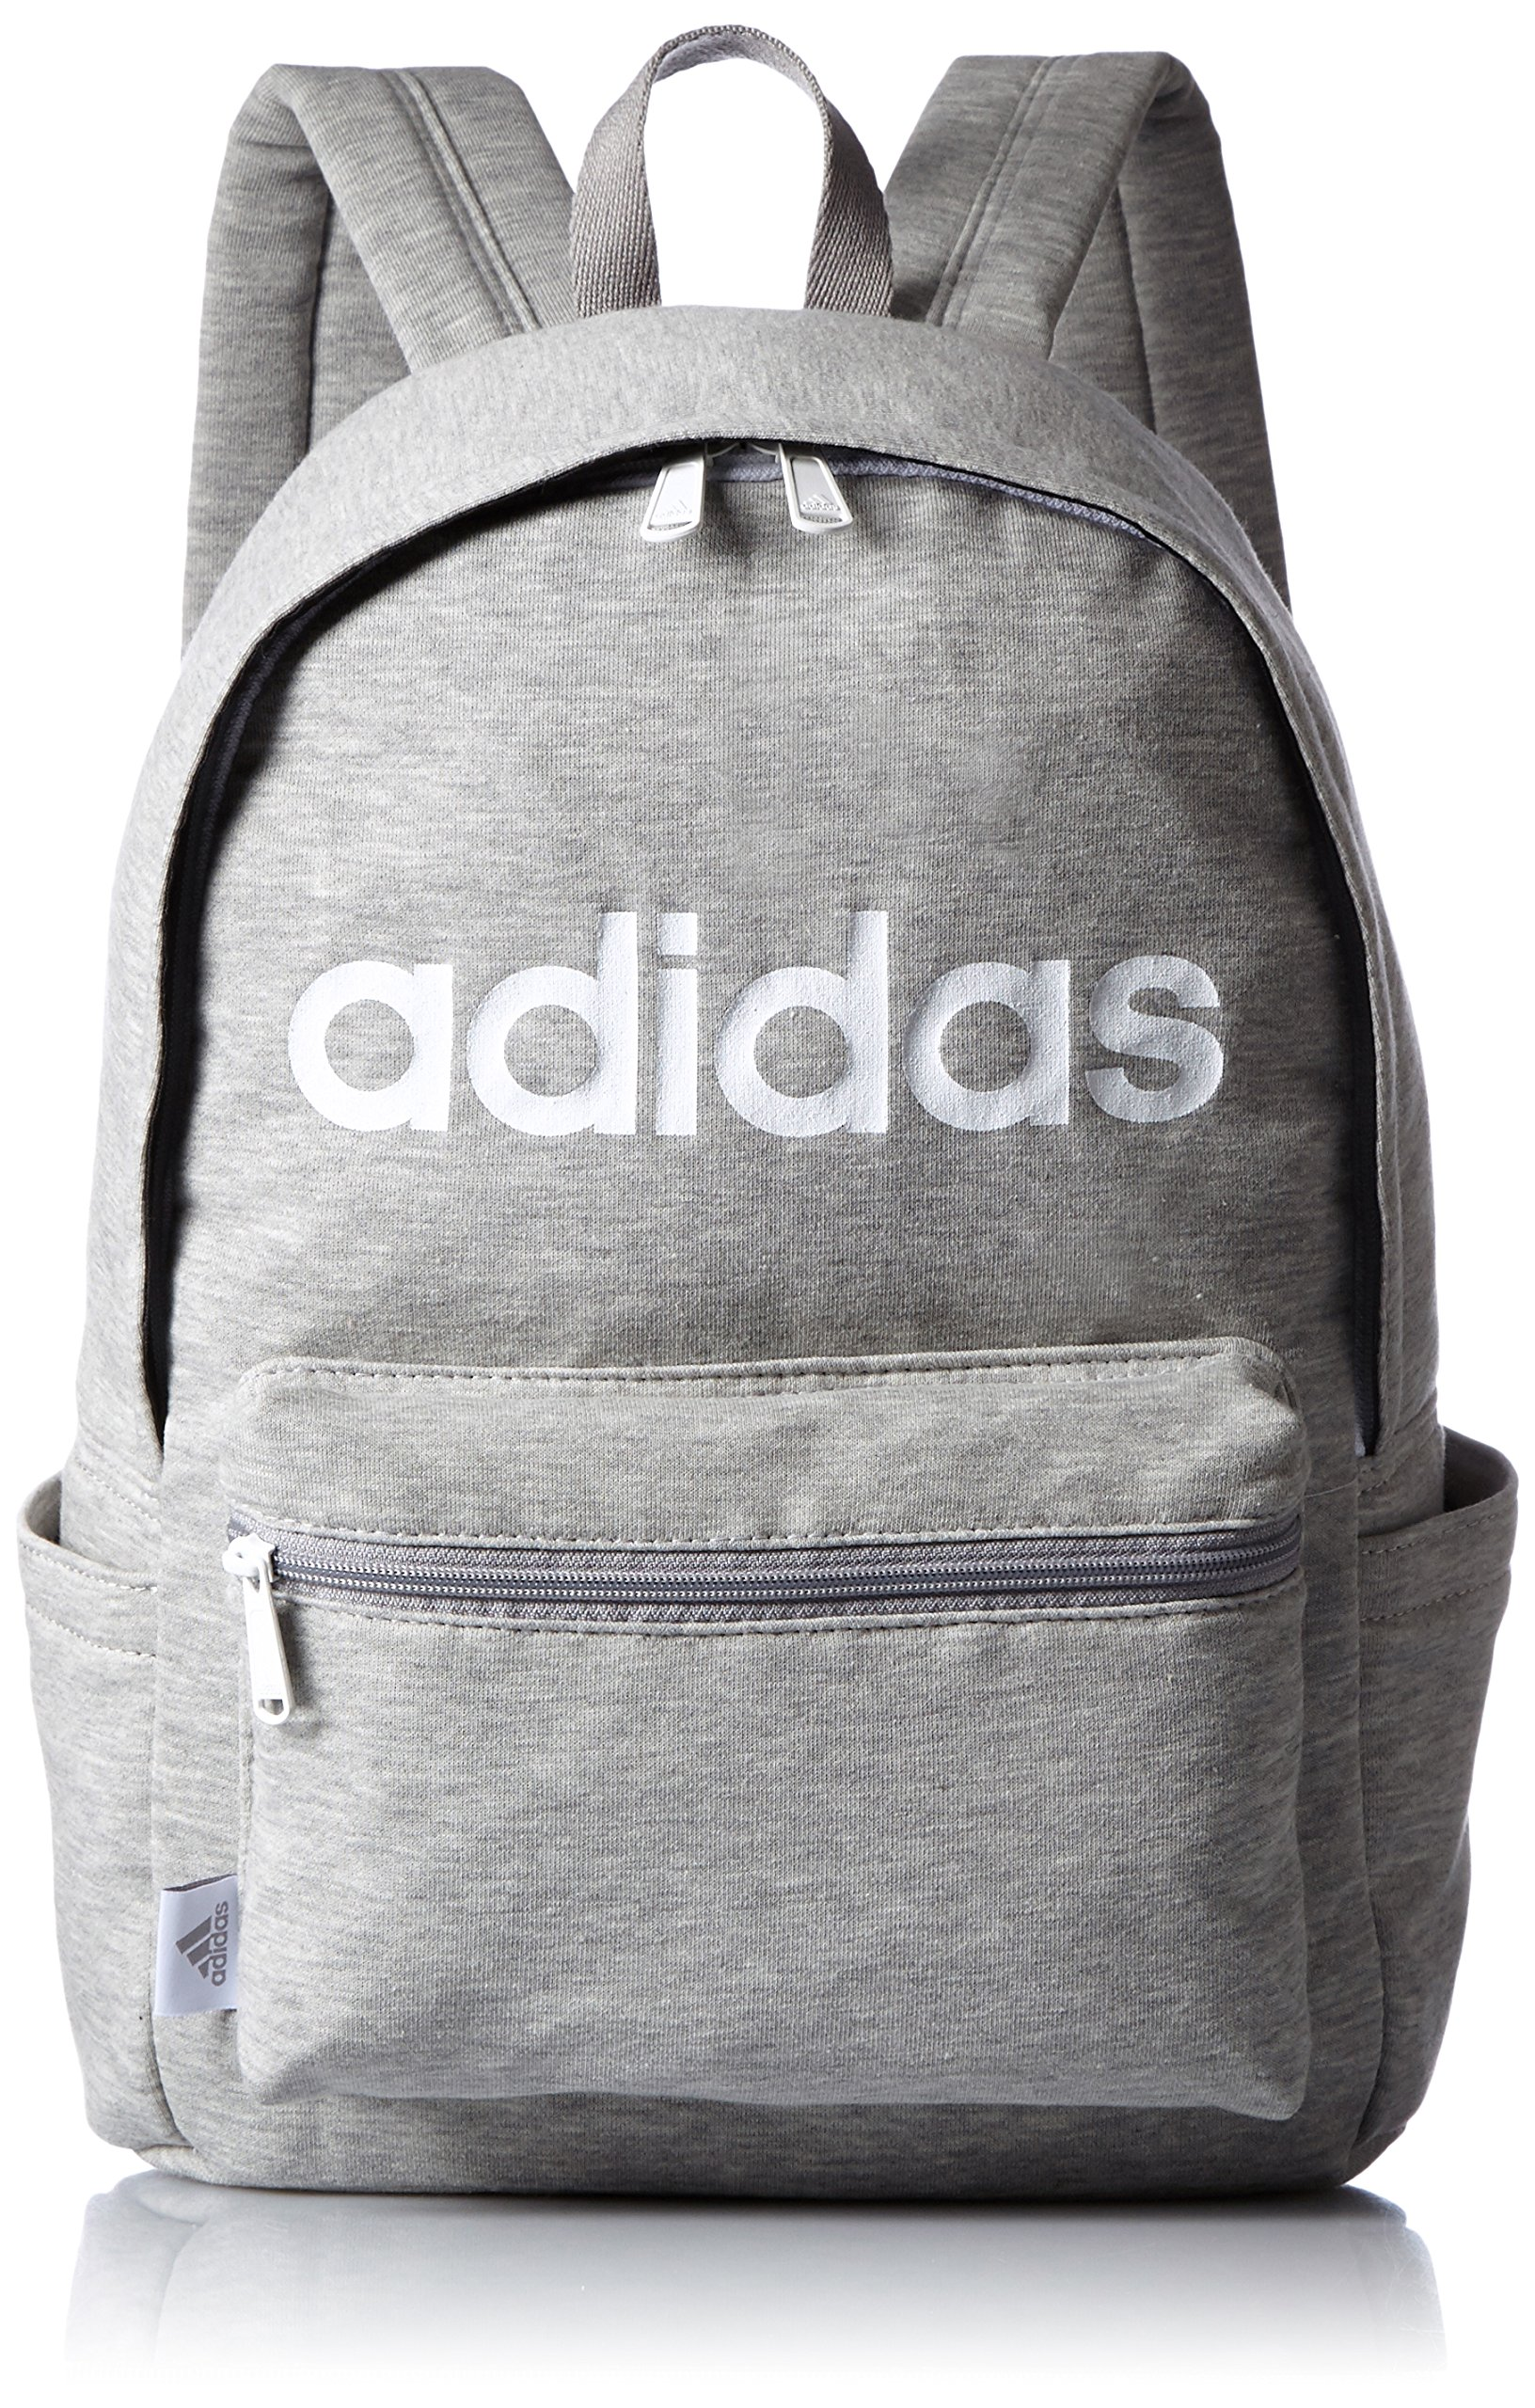 adidas Luc sport casual 42cm 17L 47423 47423 09 (medium gray heather) by adidas (Image #1)